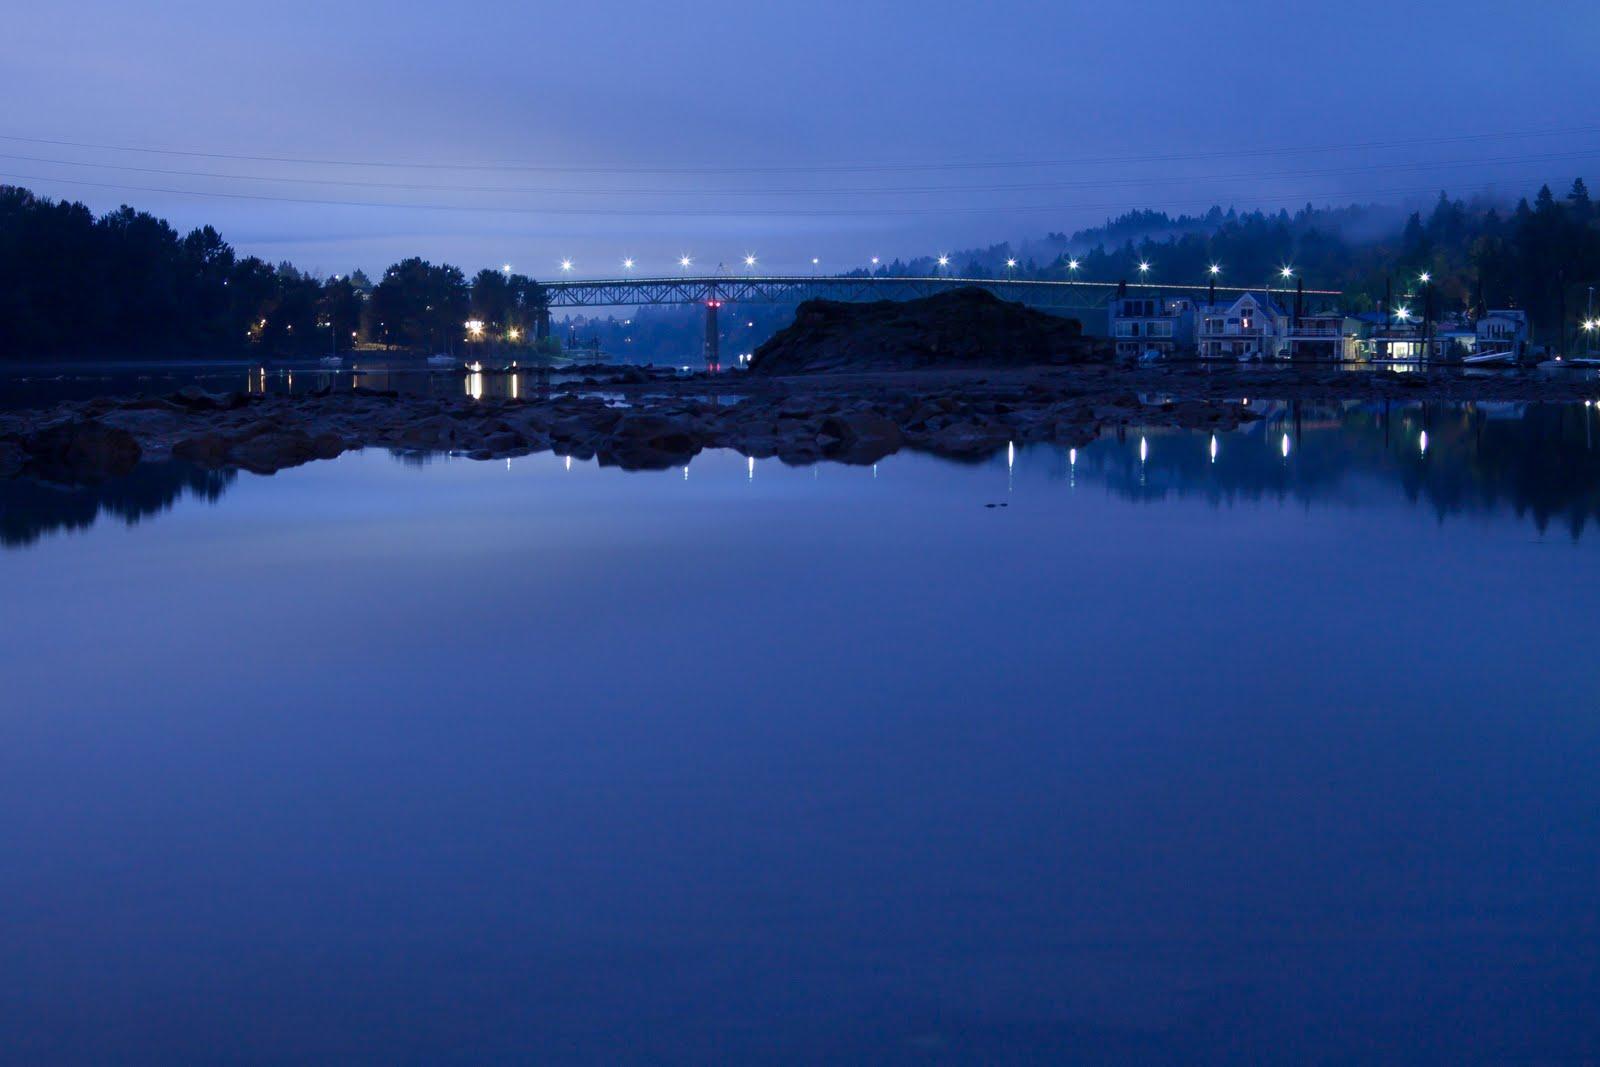 Sellwood Bridge - Sabot Images - Free photo of the week